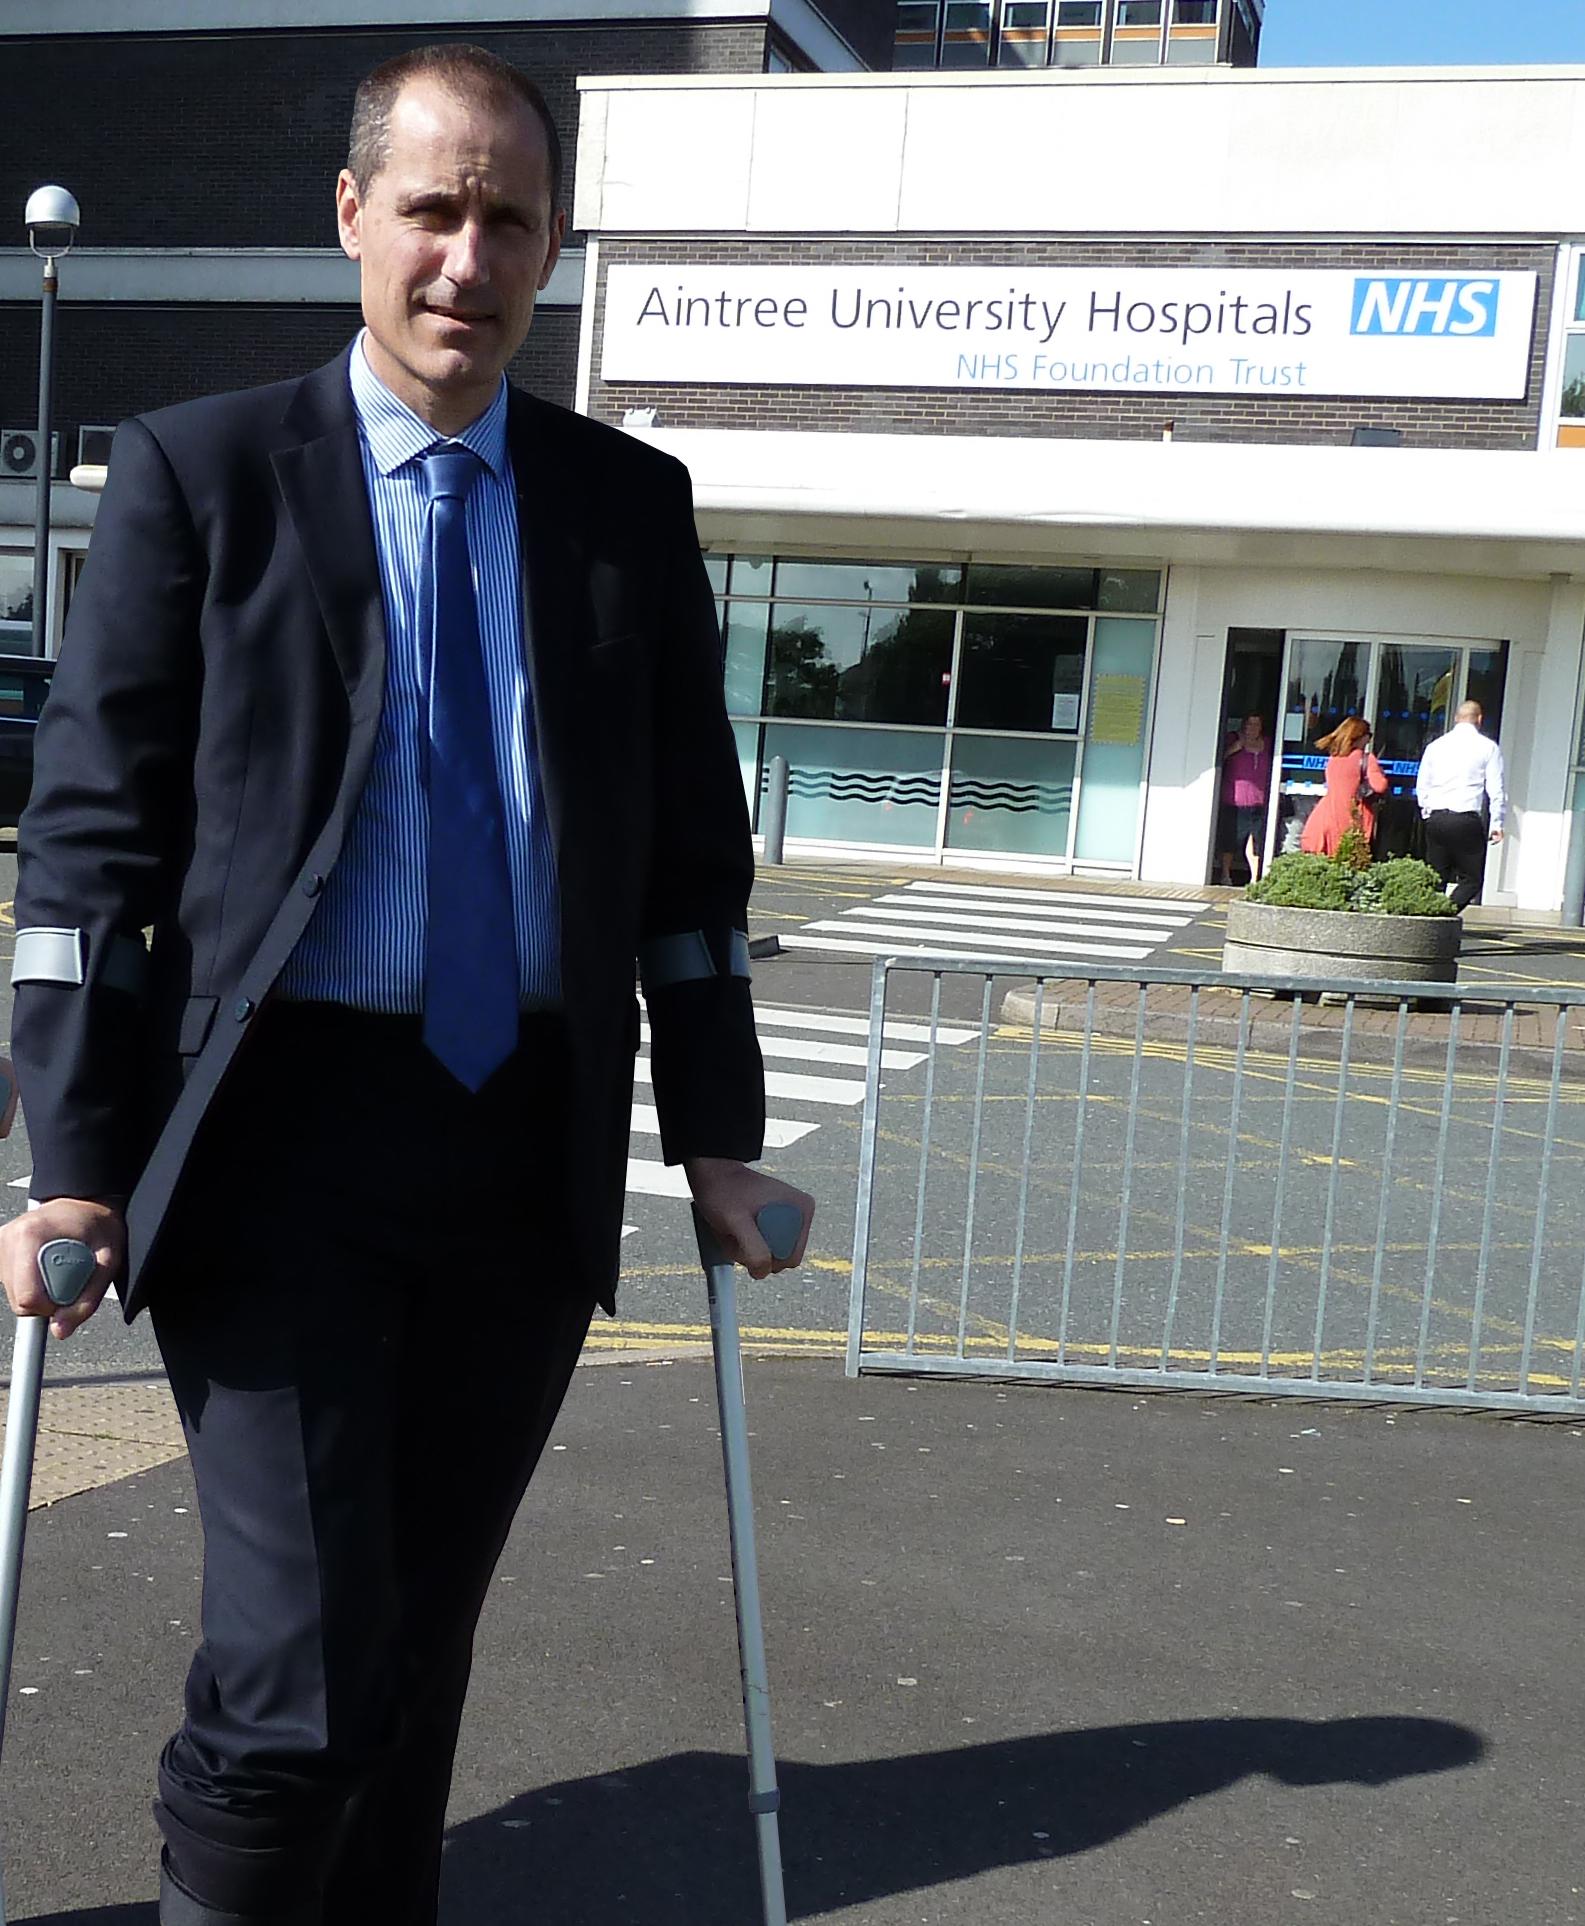 Bill Esterson at Aintree Hospital